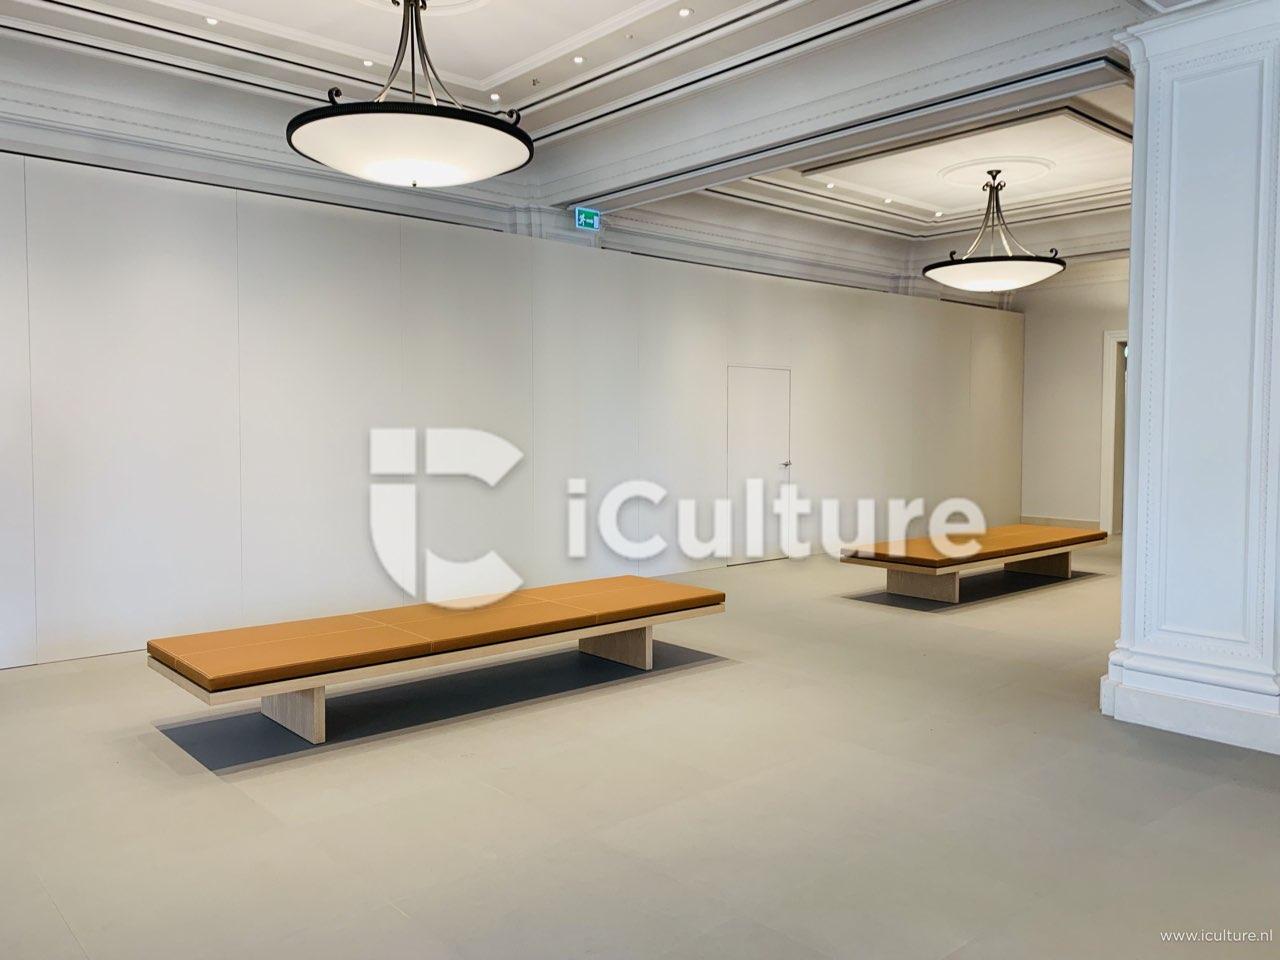 Apple Amsterdam verbouwing: atrium afgeschermd, lederen bankjes